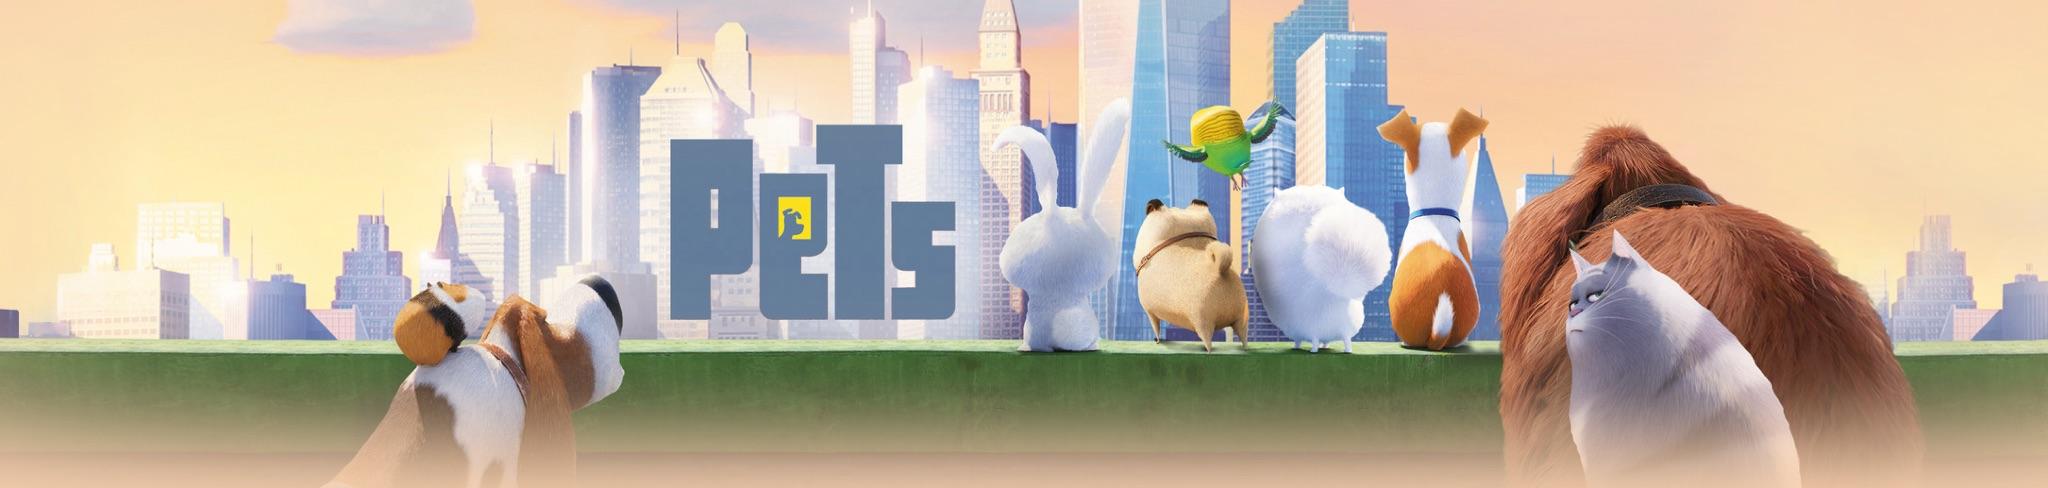 pets_film